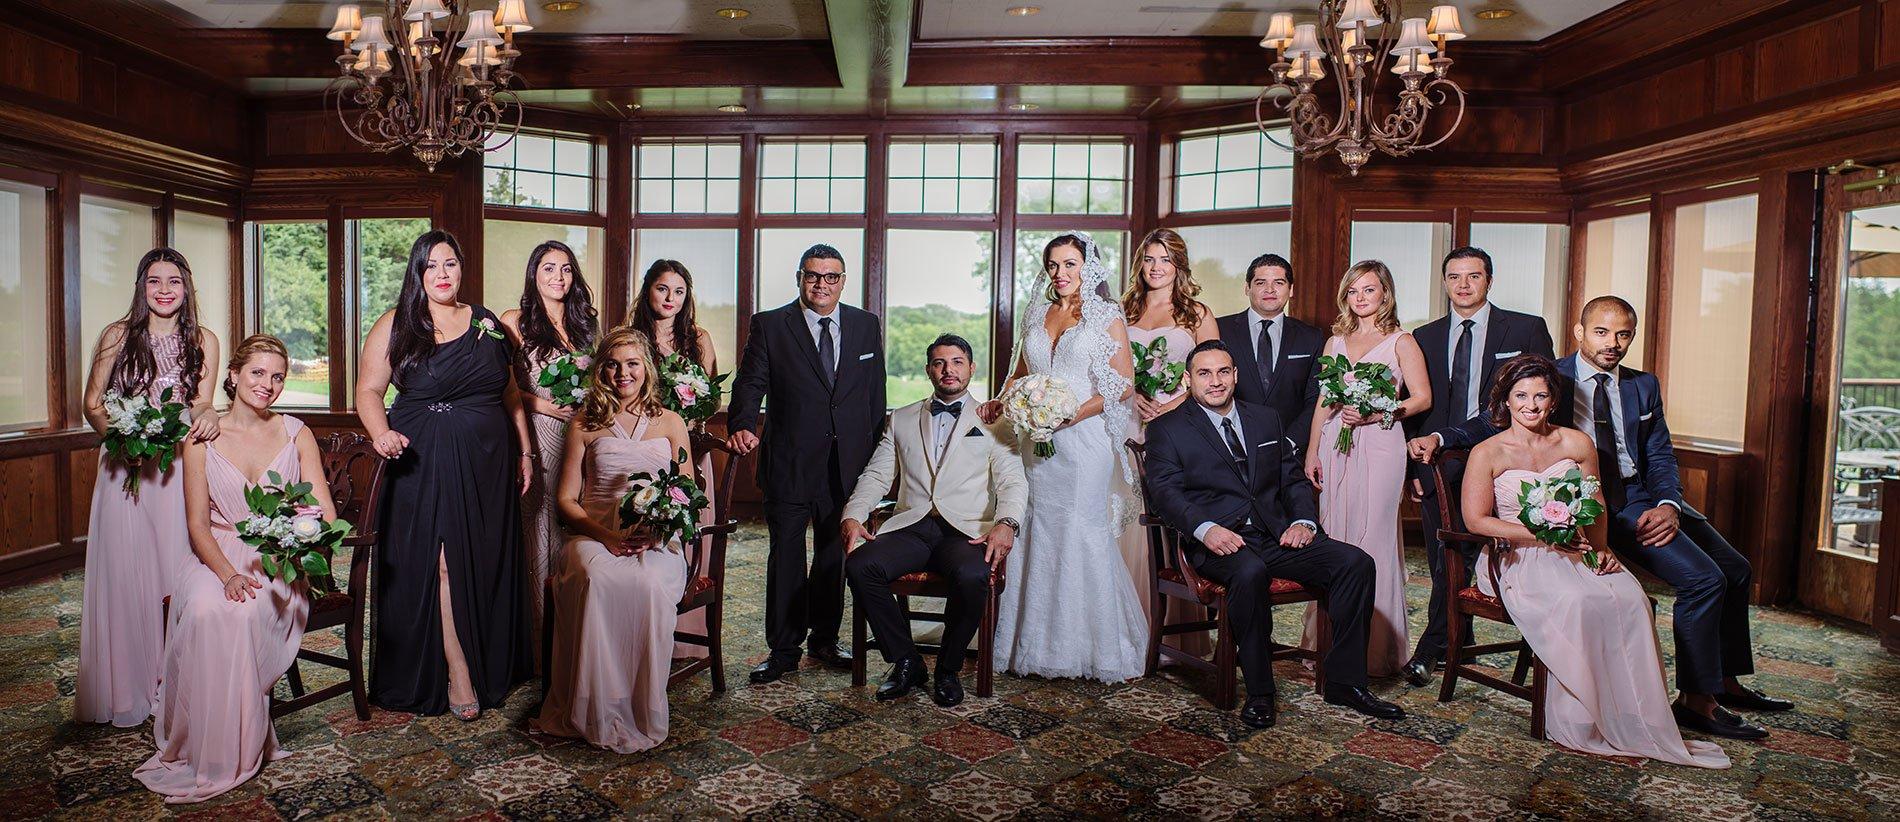 best-minneapolis-wedding-photographer-photos-006